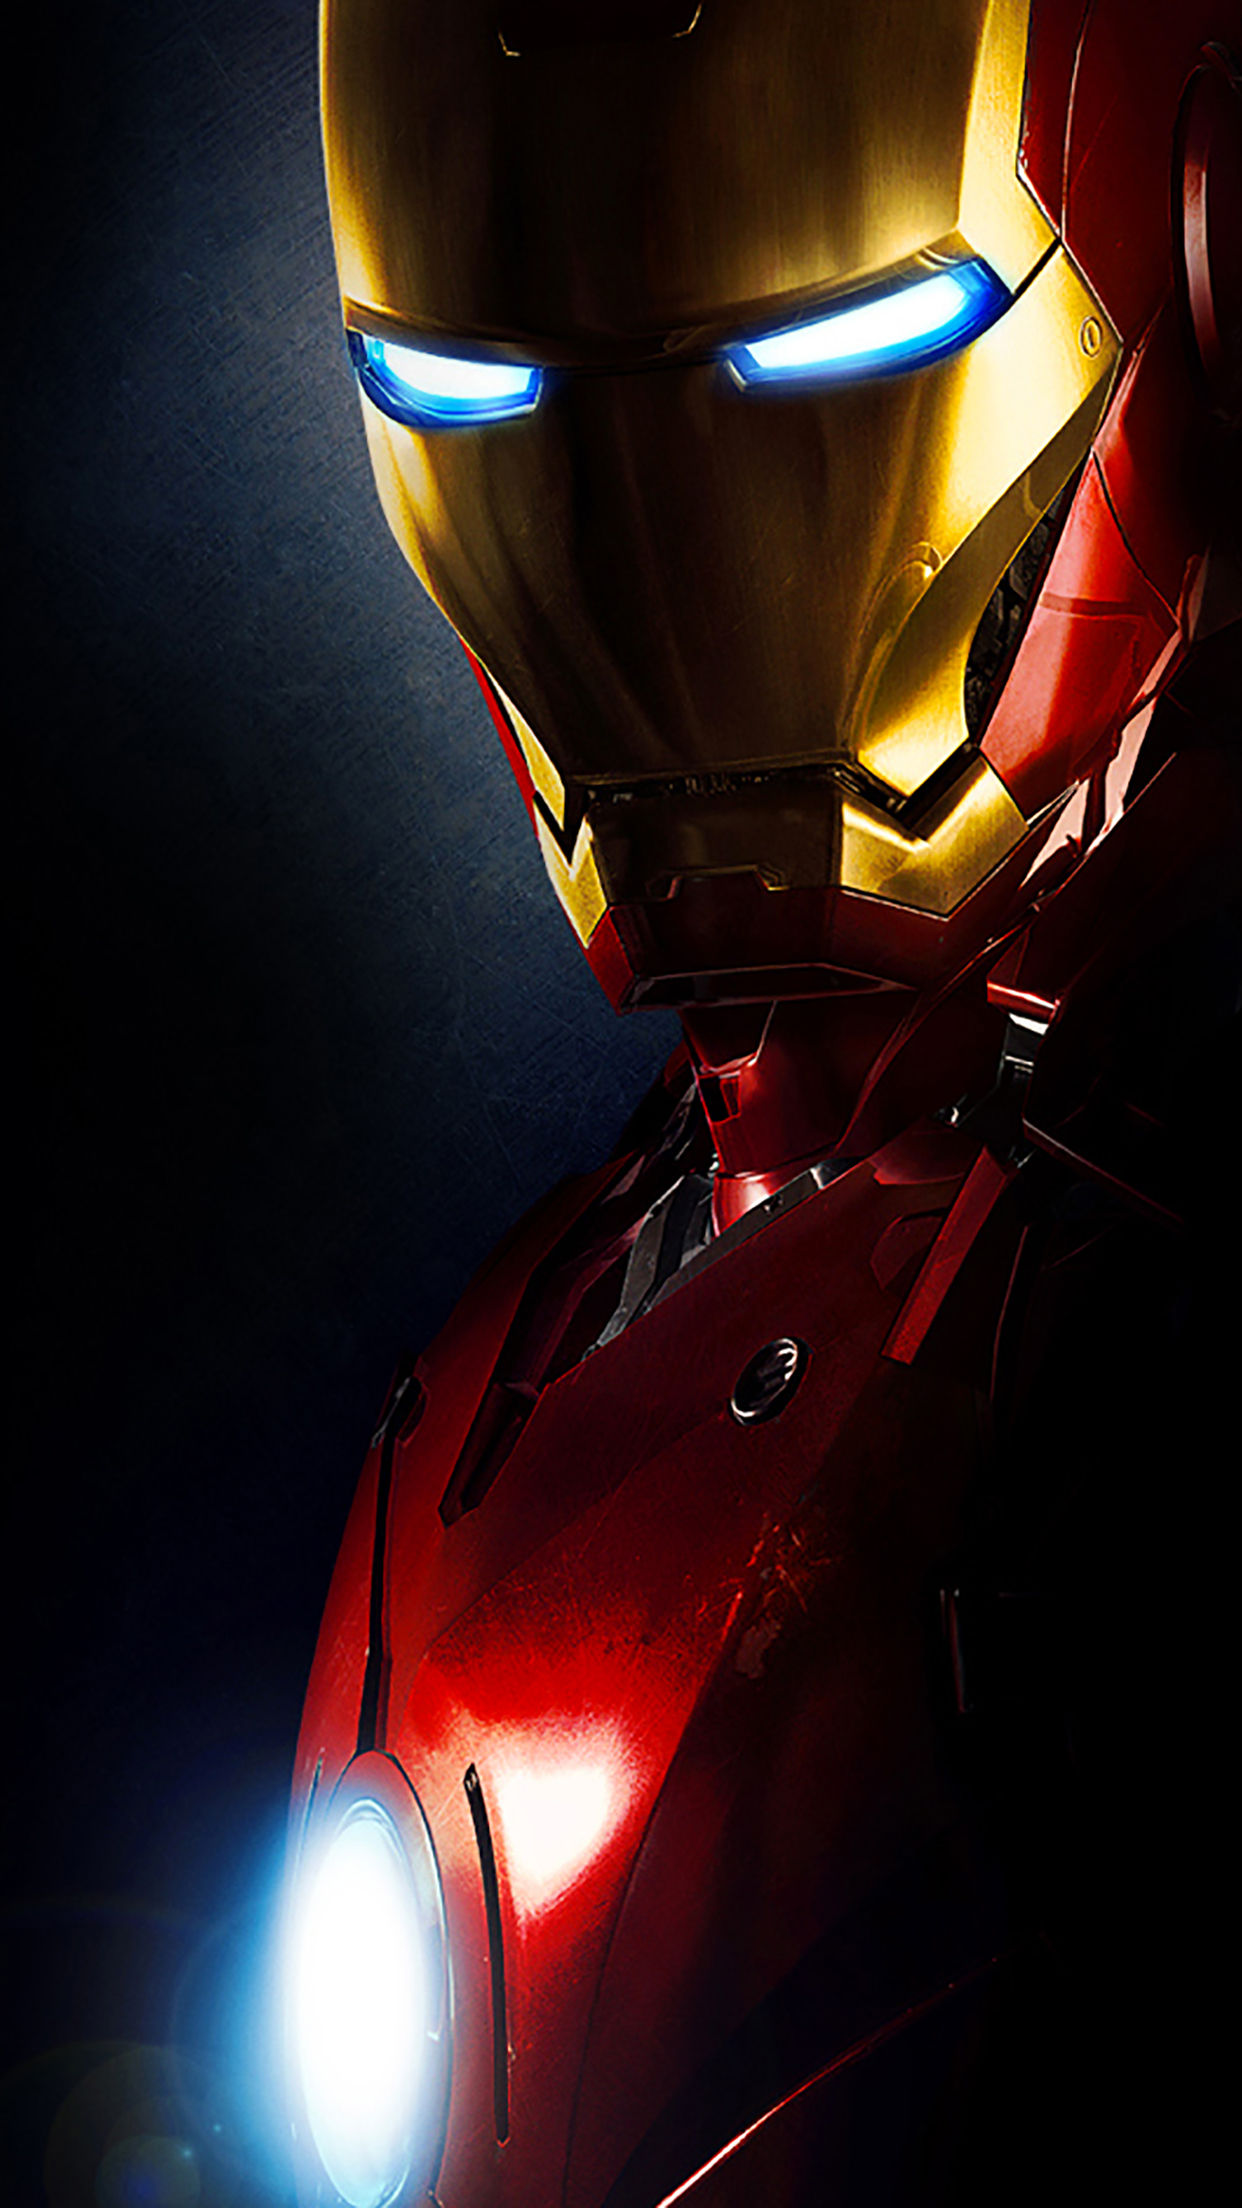 Iron Man Suit iPhone 3Wallpapers Parallax Les 3 Wallpapers iPhone du jour (19/05/2015)